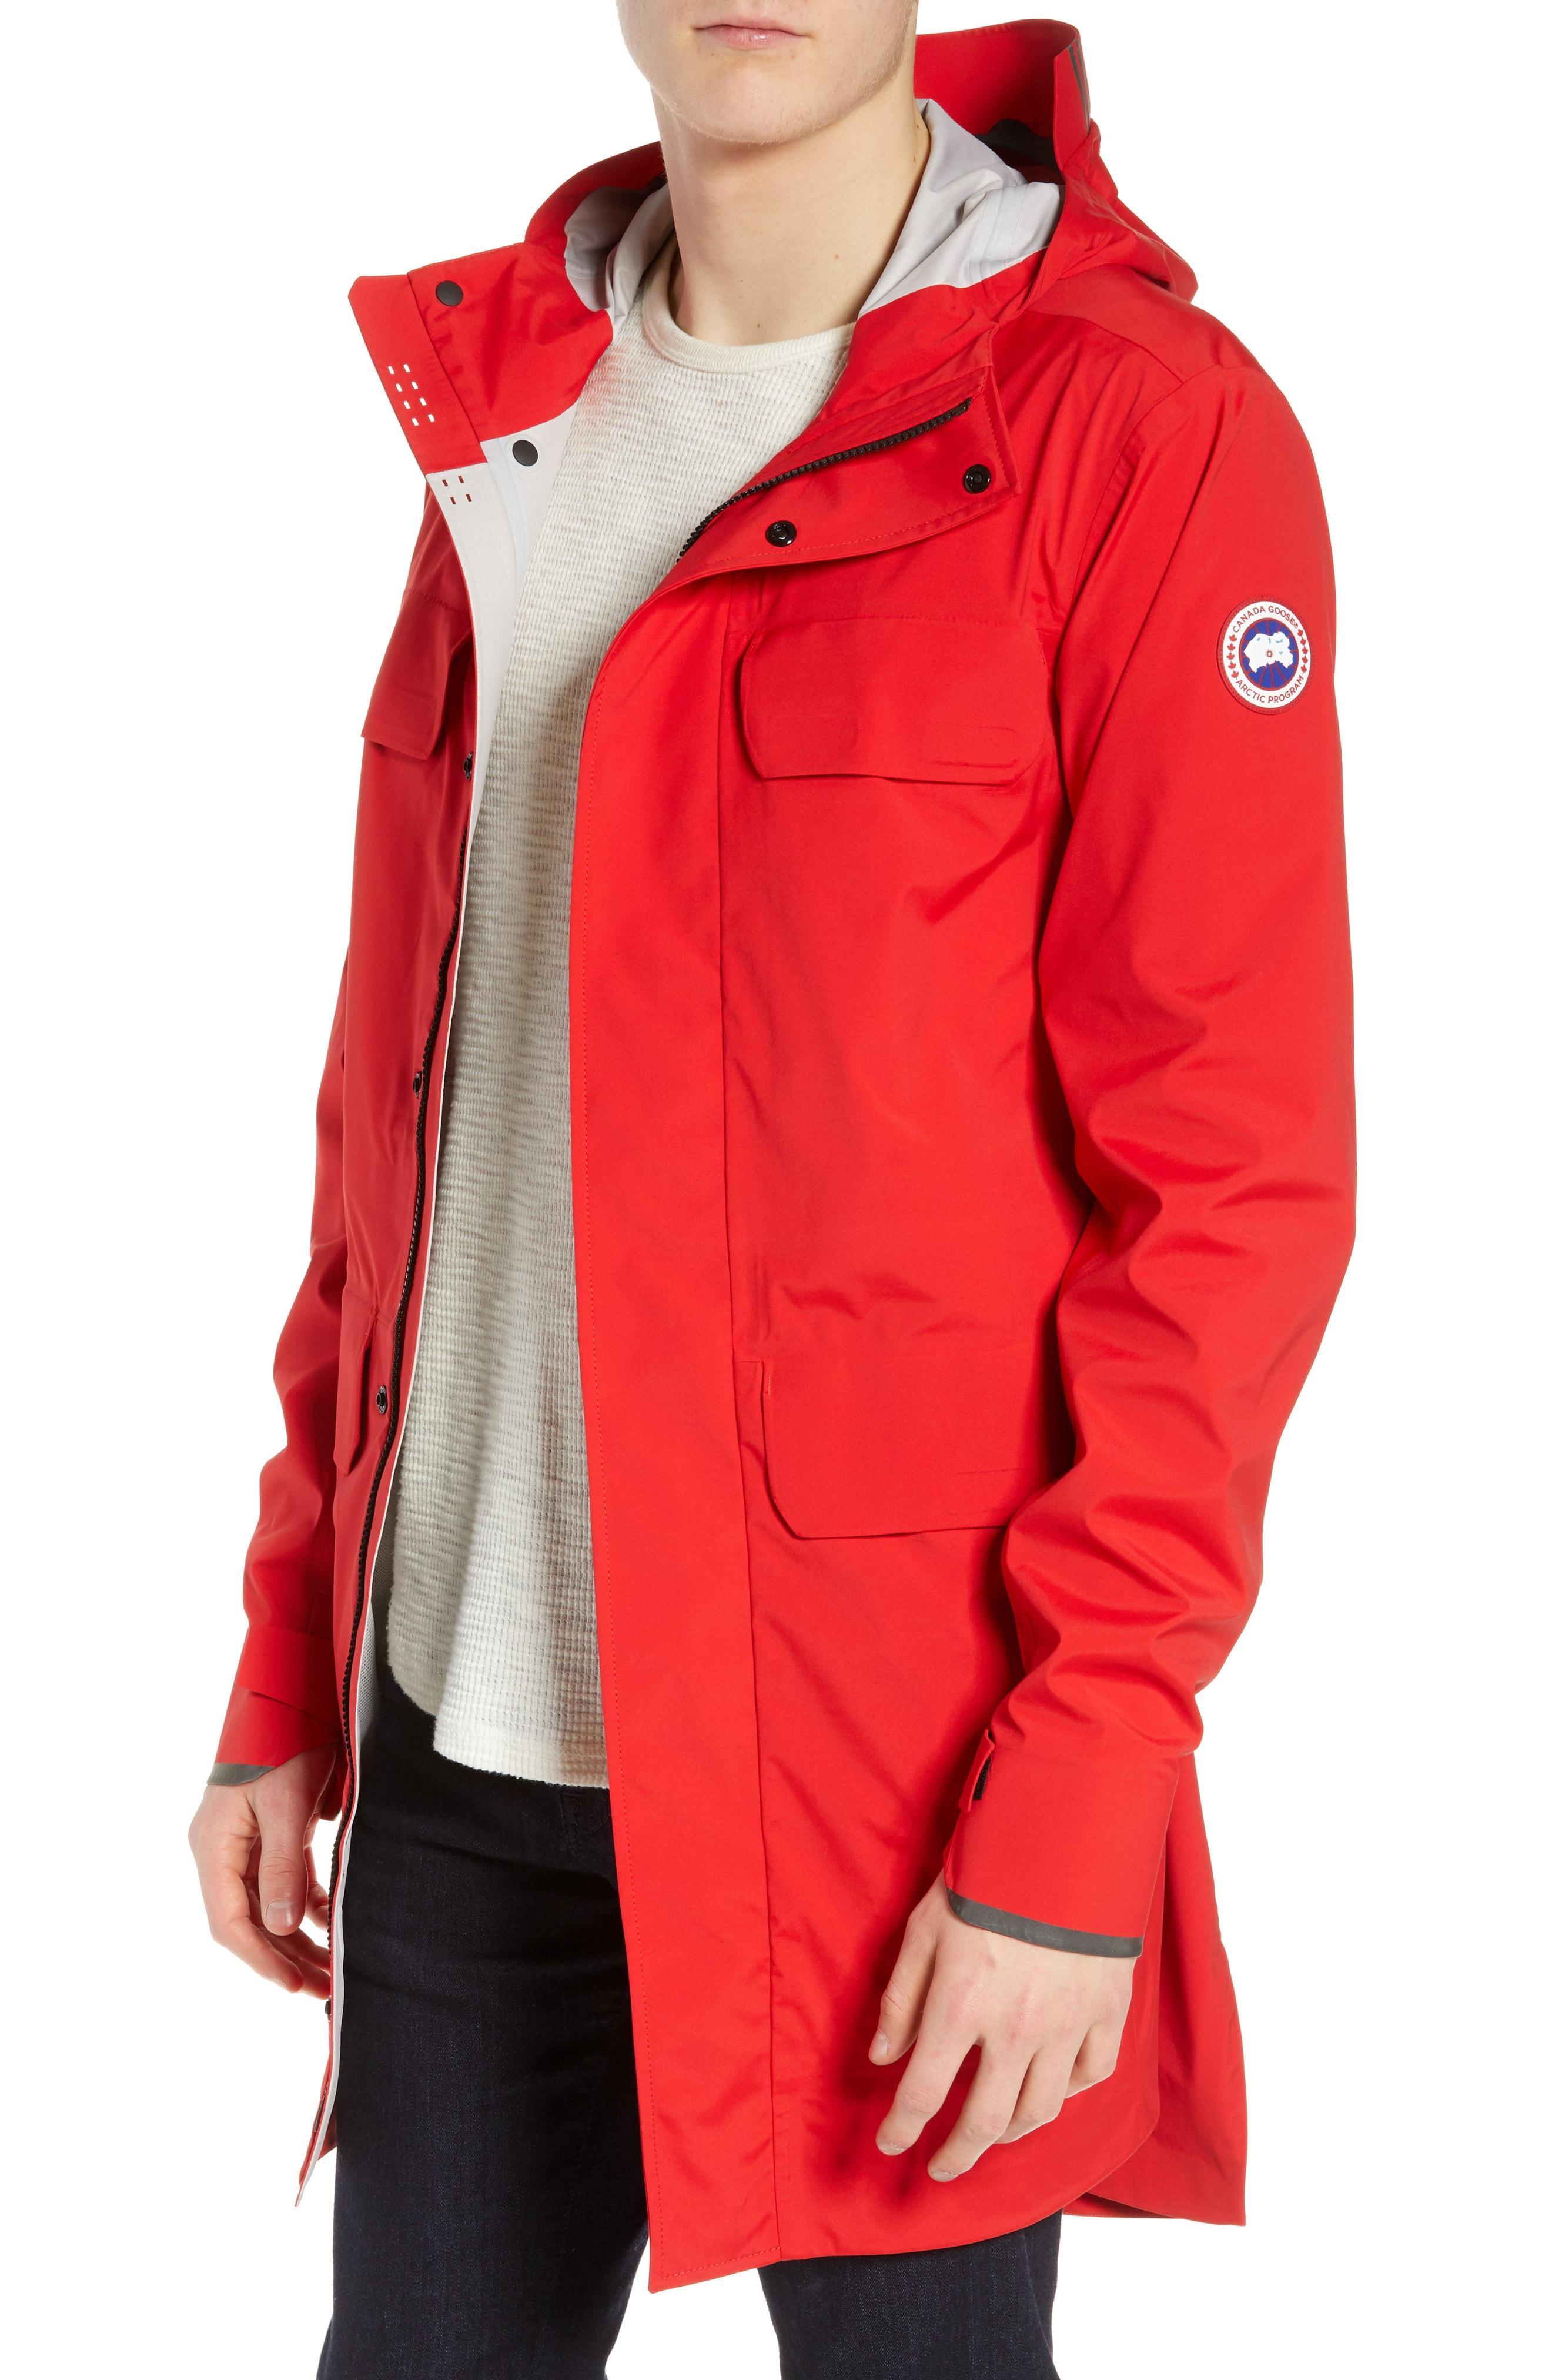 ac541fac2 Canada Goose Seawolf Regular Fit Packable Waterproof Jacket, Red in ...